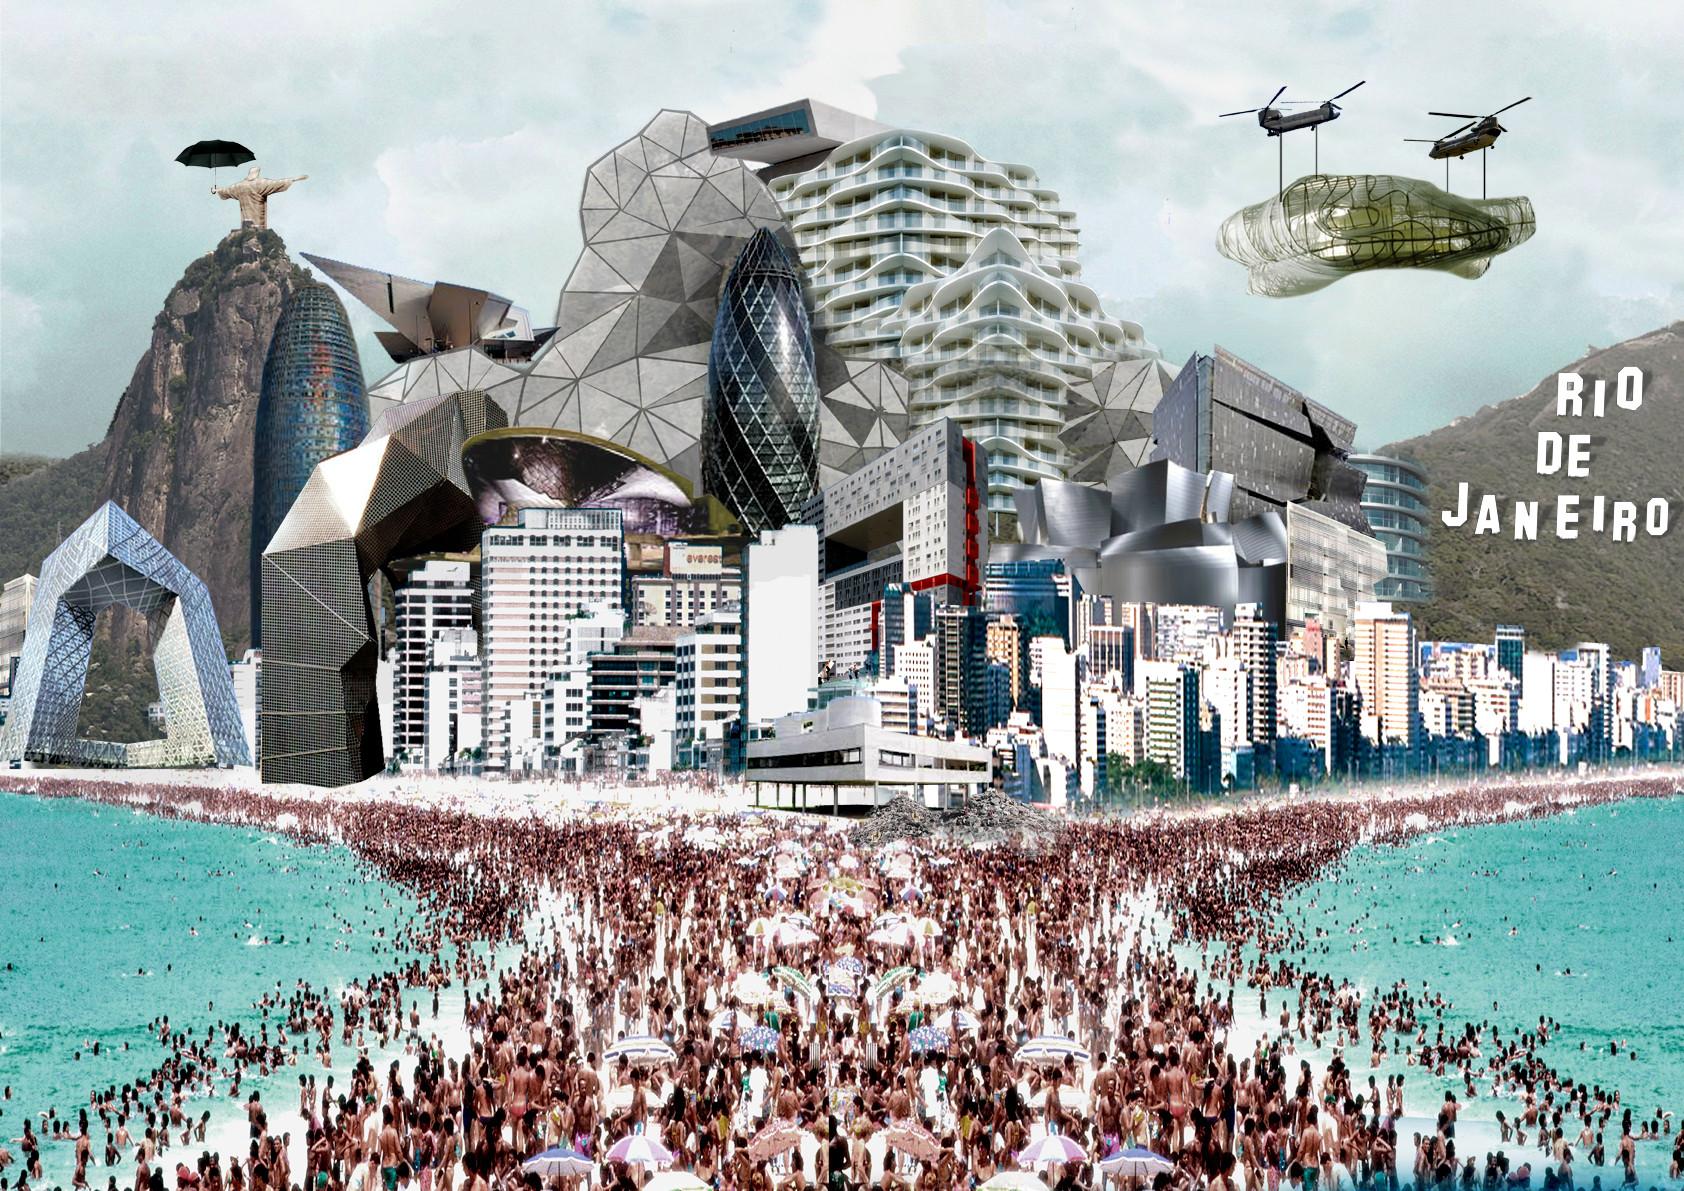 2013 Rio de Janeiro Cityvision Competition Winners Announced